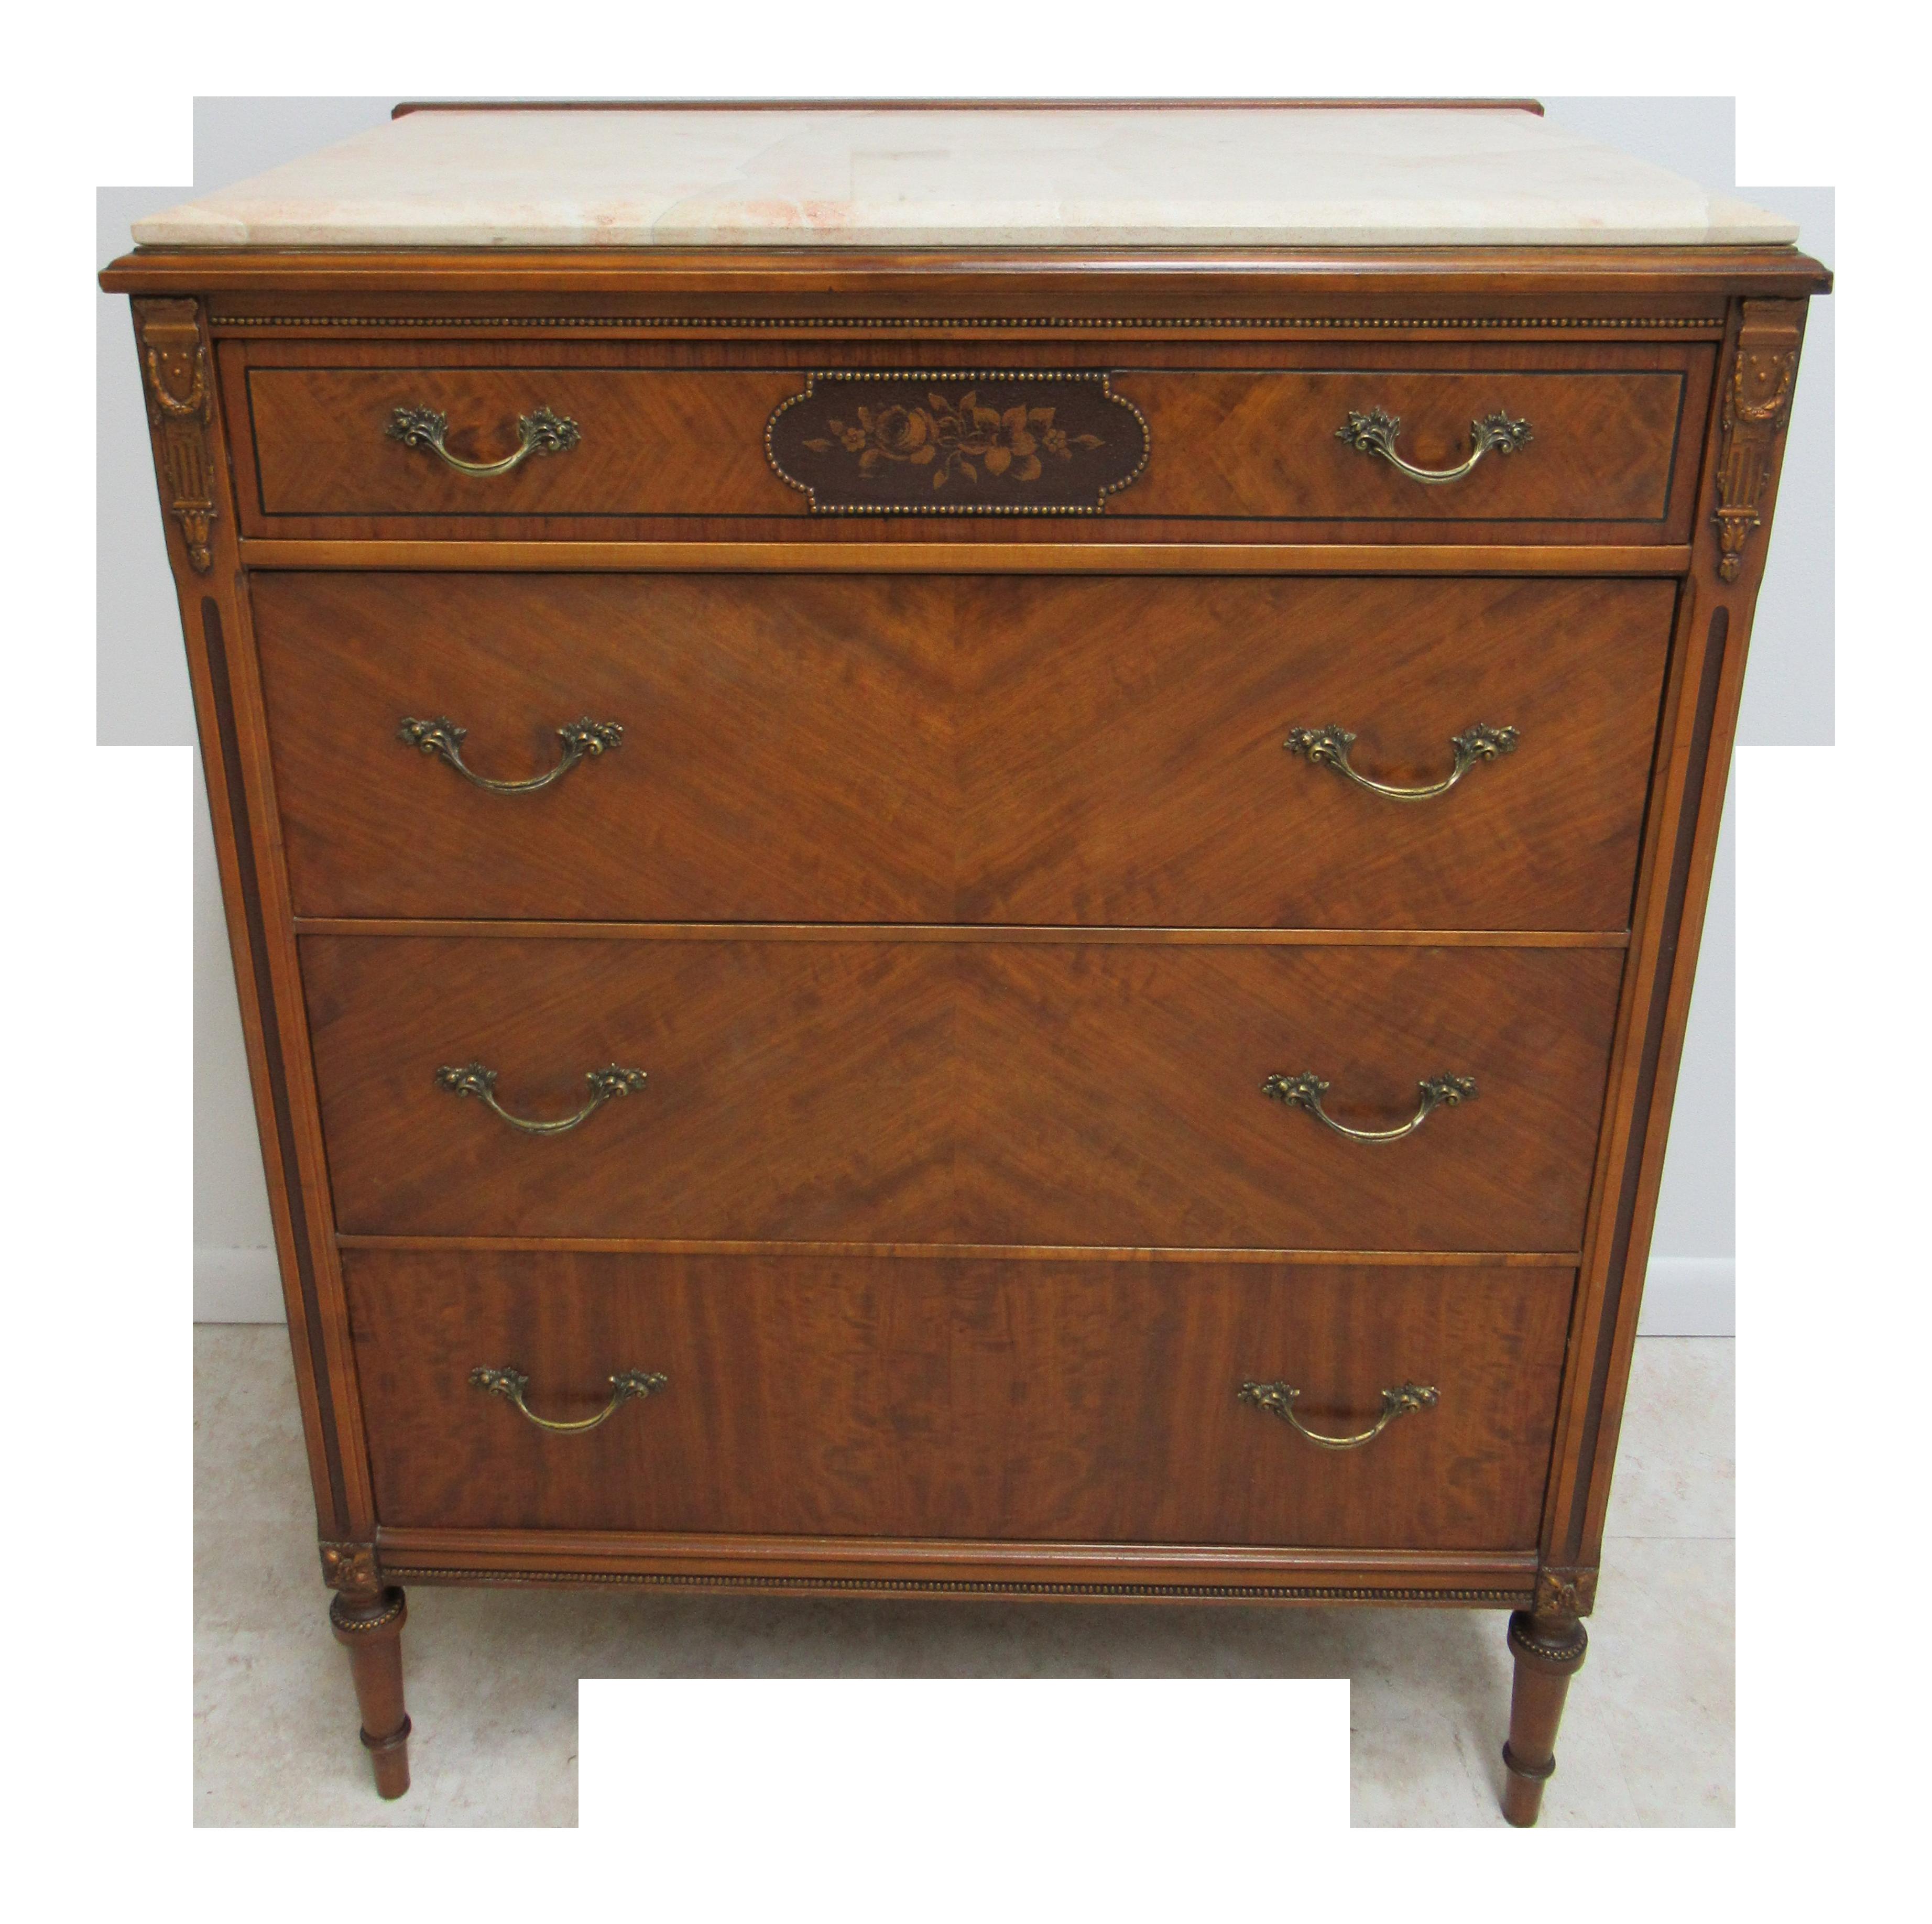 Genial 1930s Regency Sligh Lowry Furniture Walnut Marble Top High Chest Dresser |  Chairish